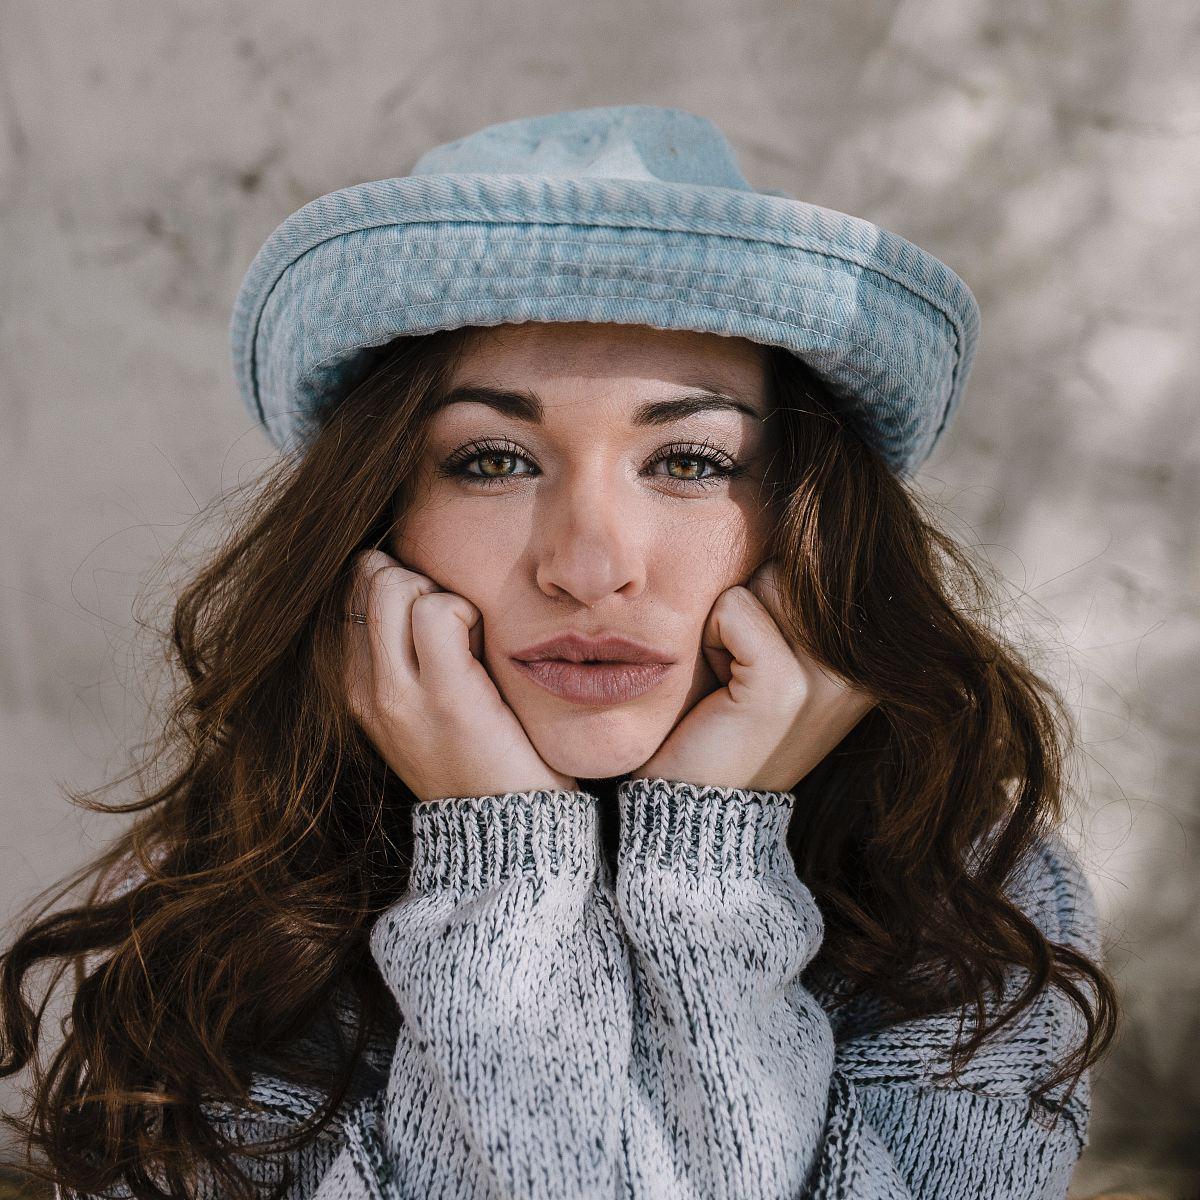 stock photos free  of women's blue hat